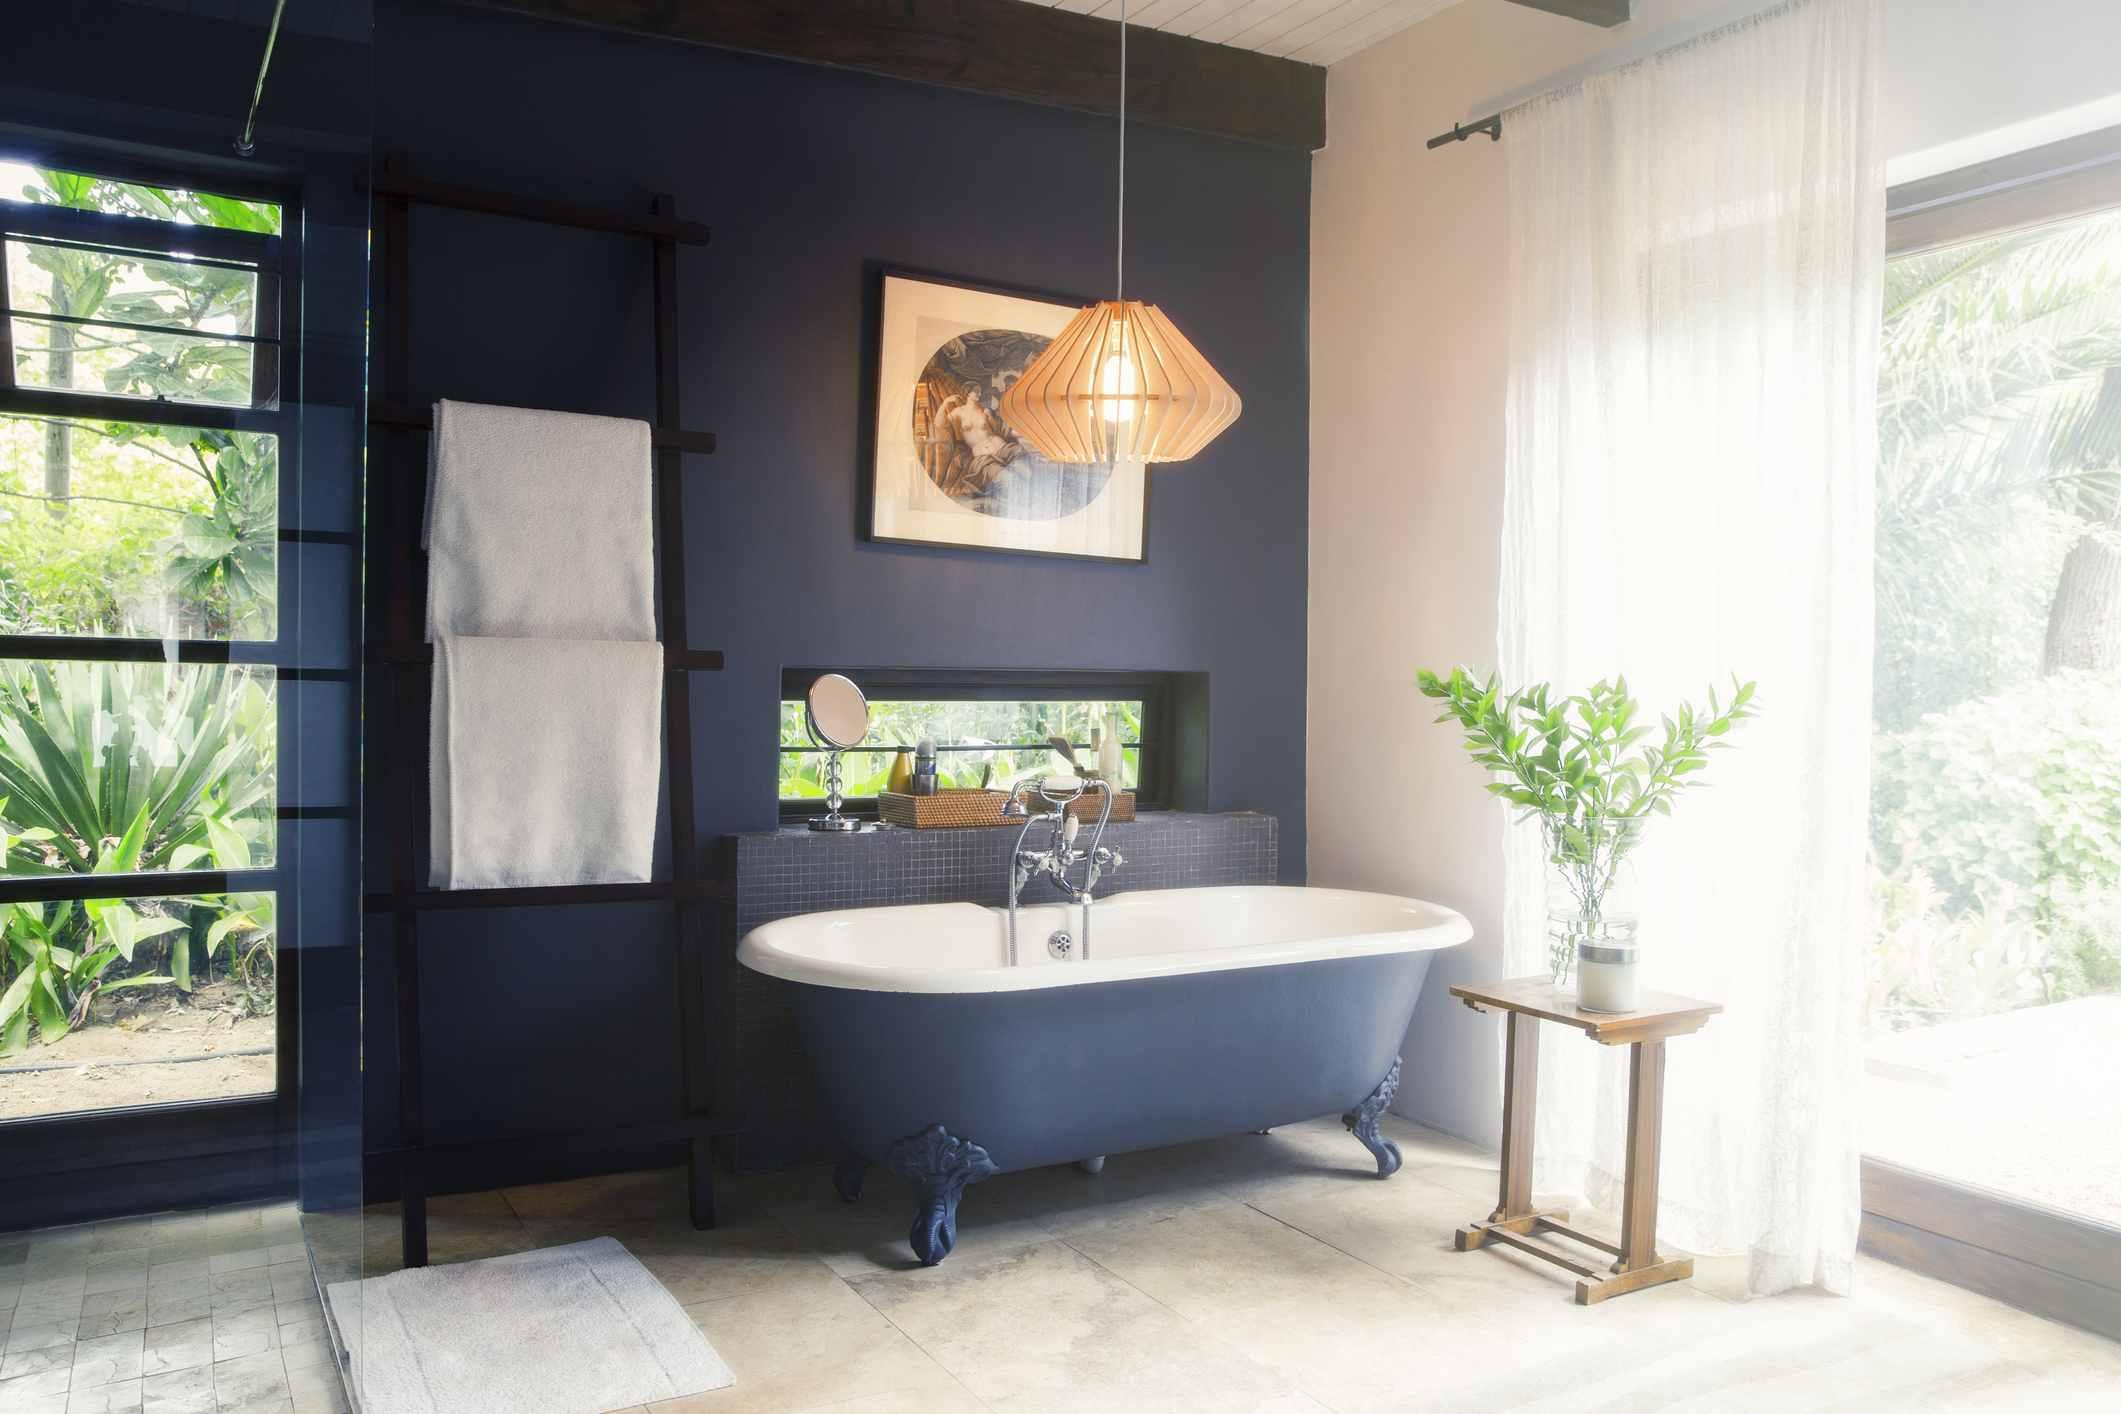 A dark blue bathroom with a bathtub and towel rack with a beautiful backyard view